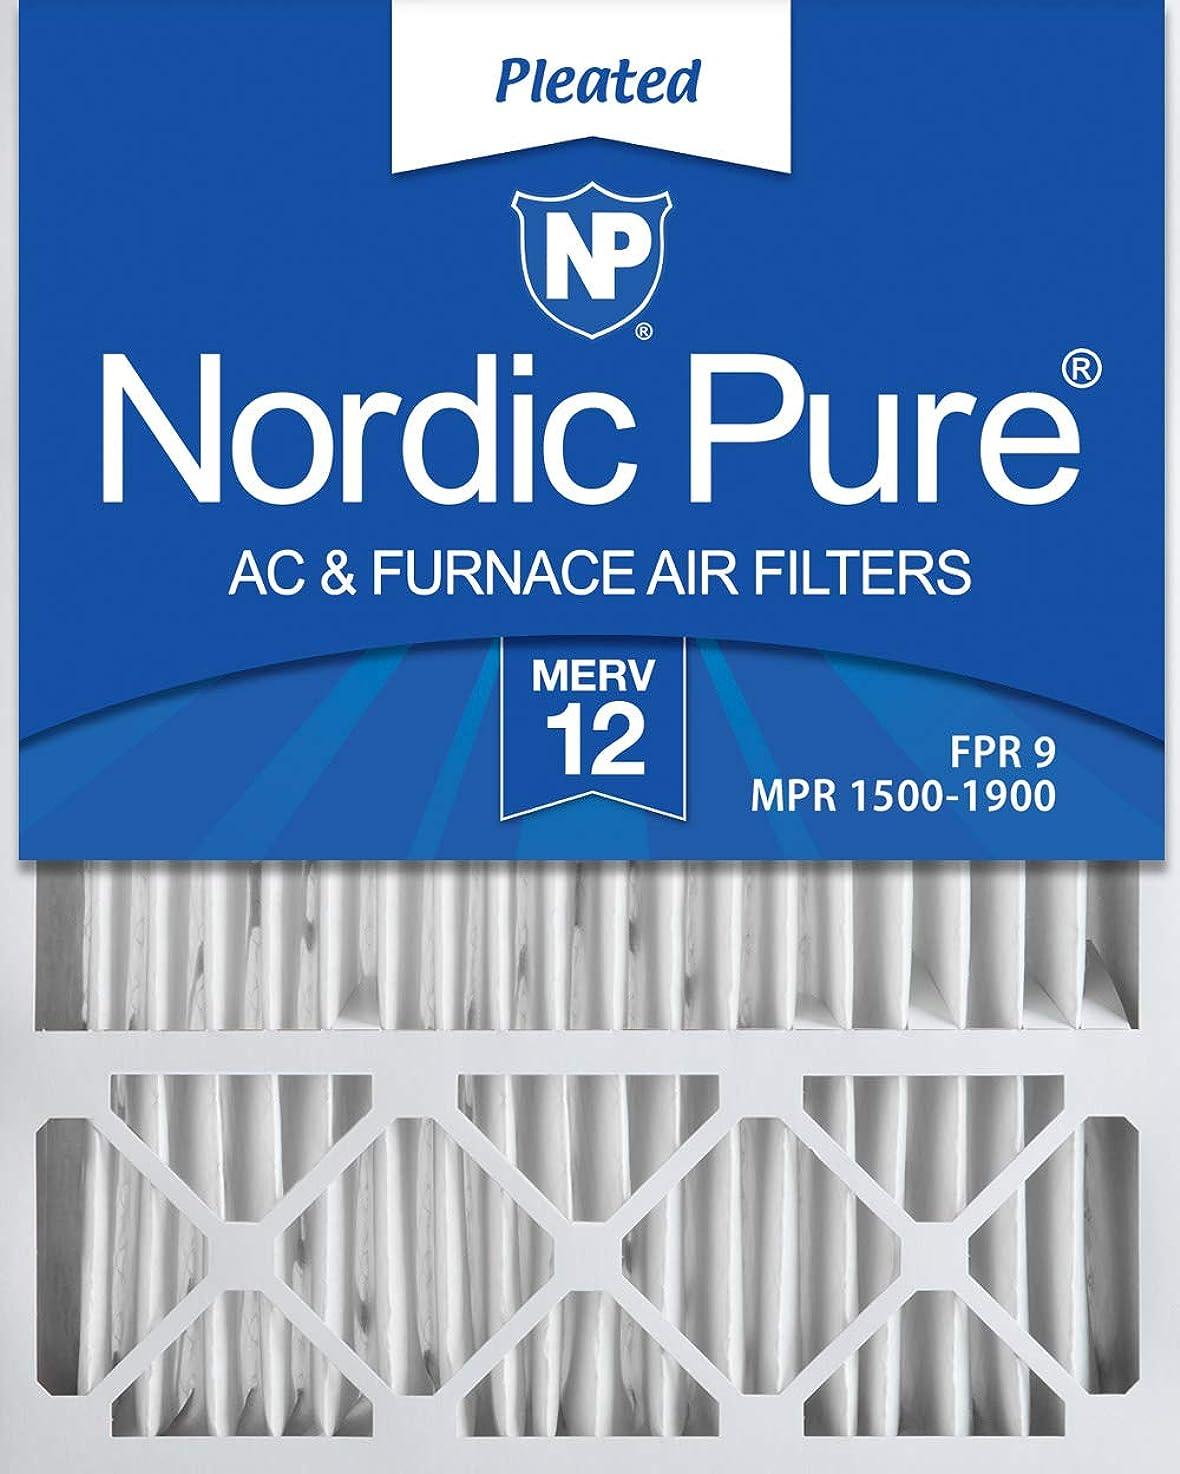 Nordic Pure 20x25x5 (4-3/8 Actual Depth) MERV 12 Lennox X6673 Replacement AC Furnace Air Filter, Box of 1